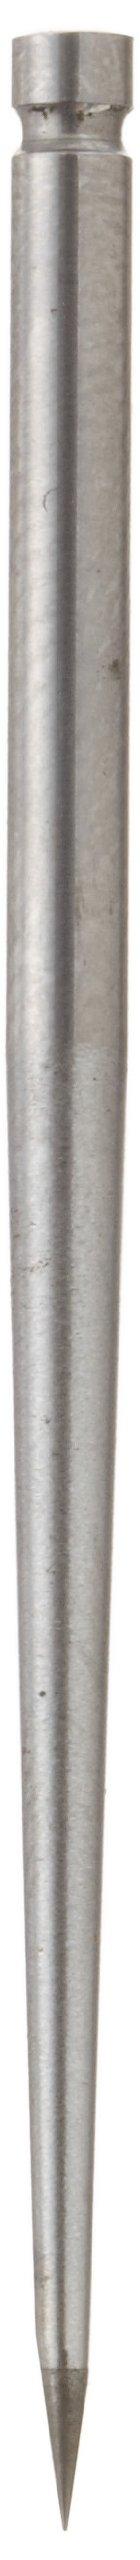 Starrett PT14398 Carbide Point For Pocket Scriber No. 70AX